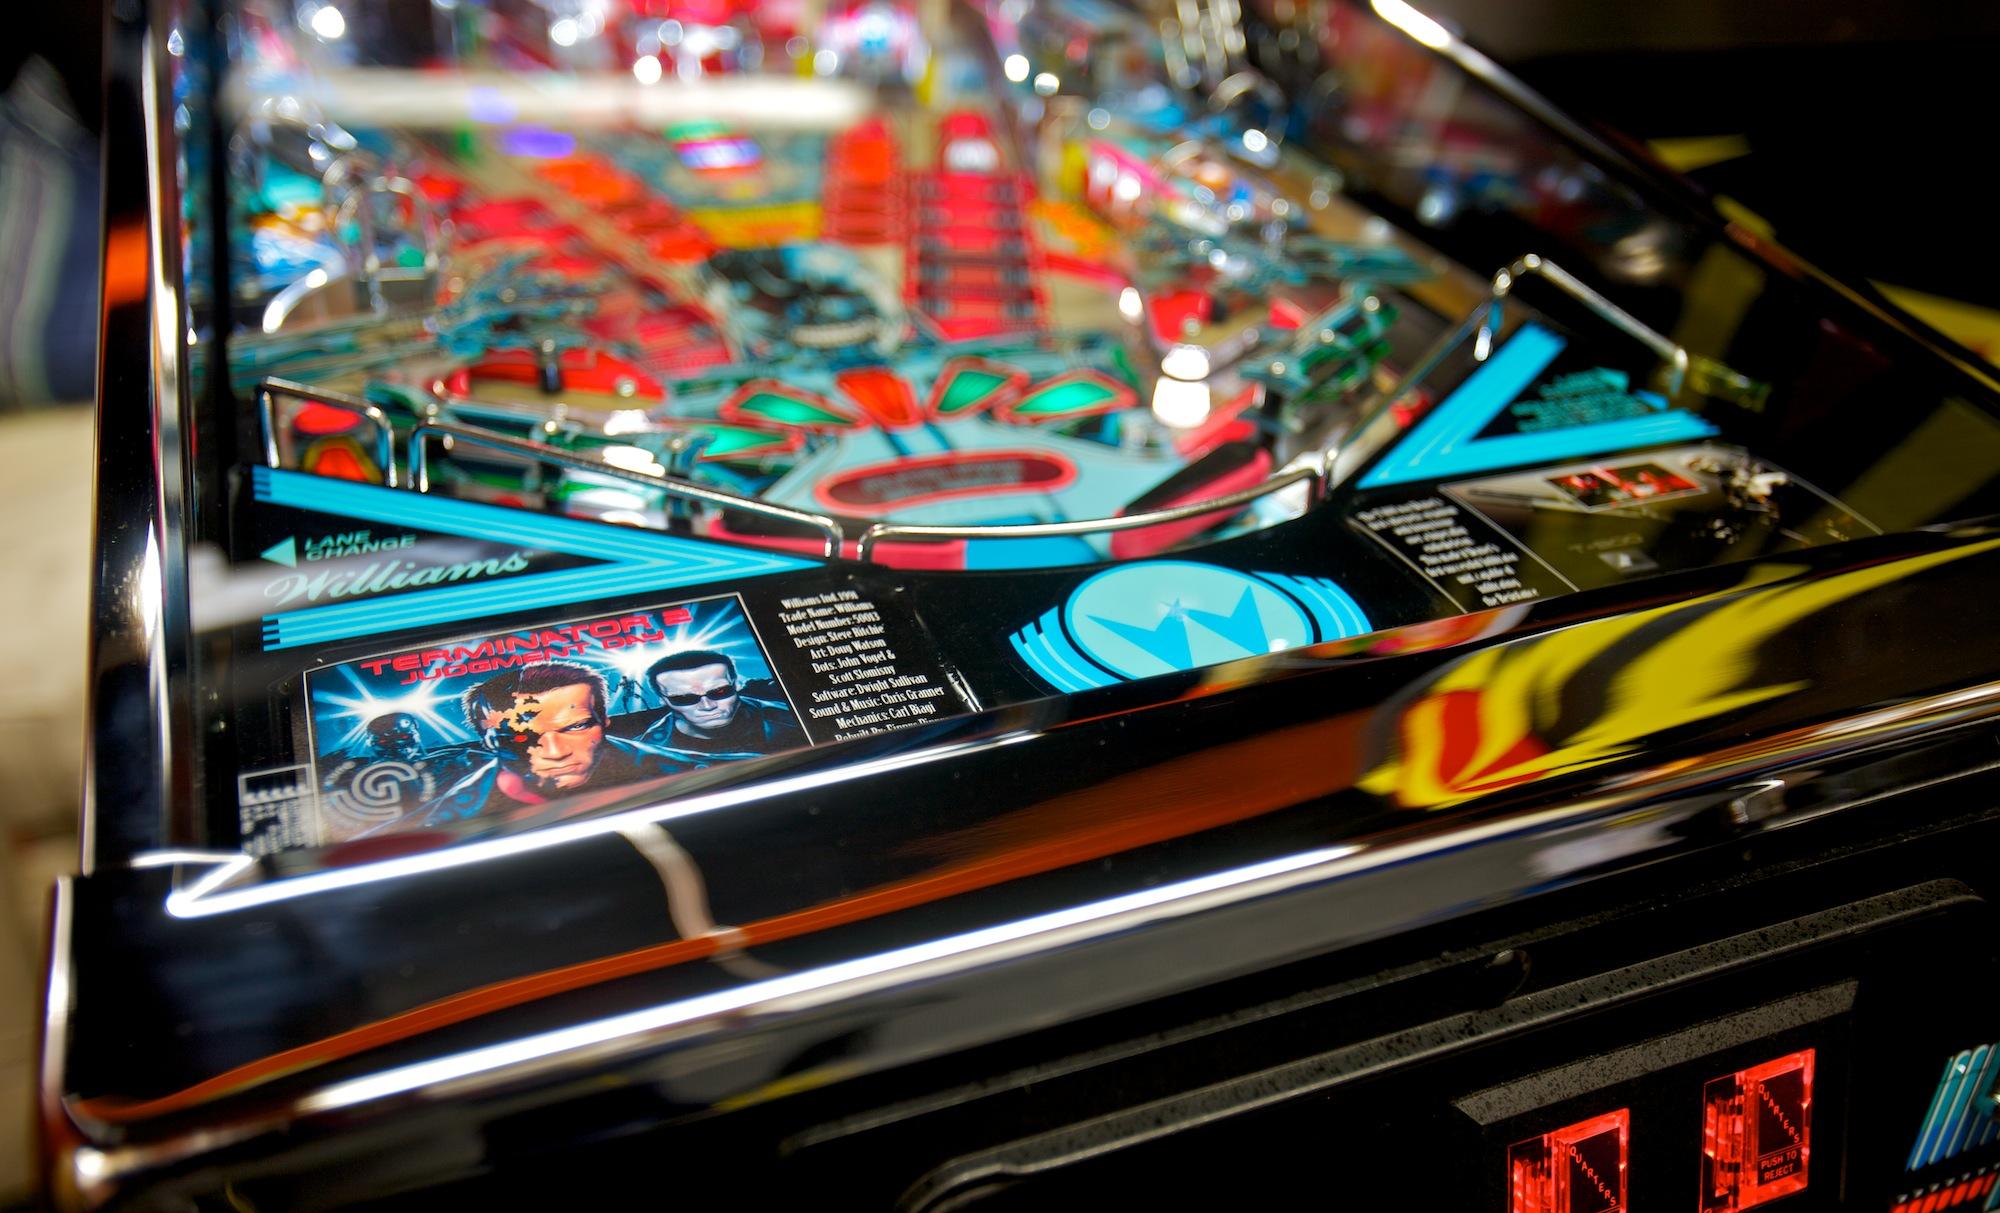 File:A rebuilt Terminator 2 pinball machine by Wayne Patrick